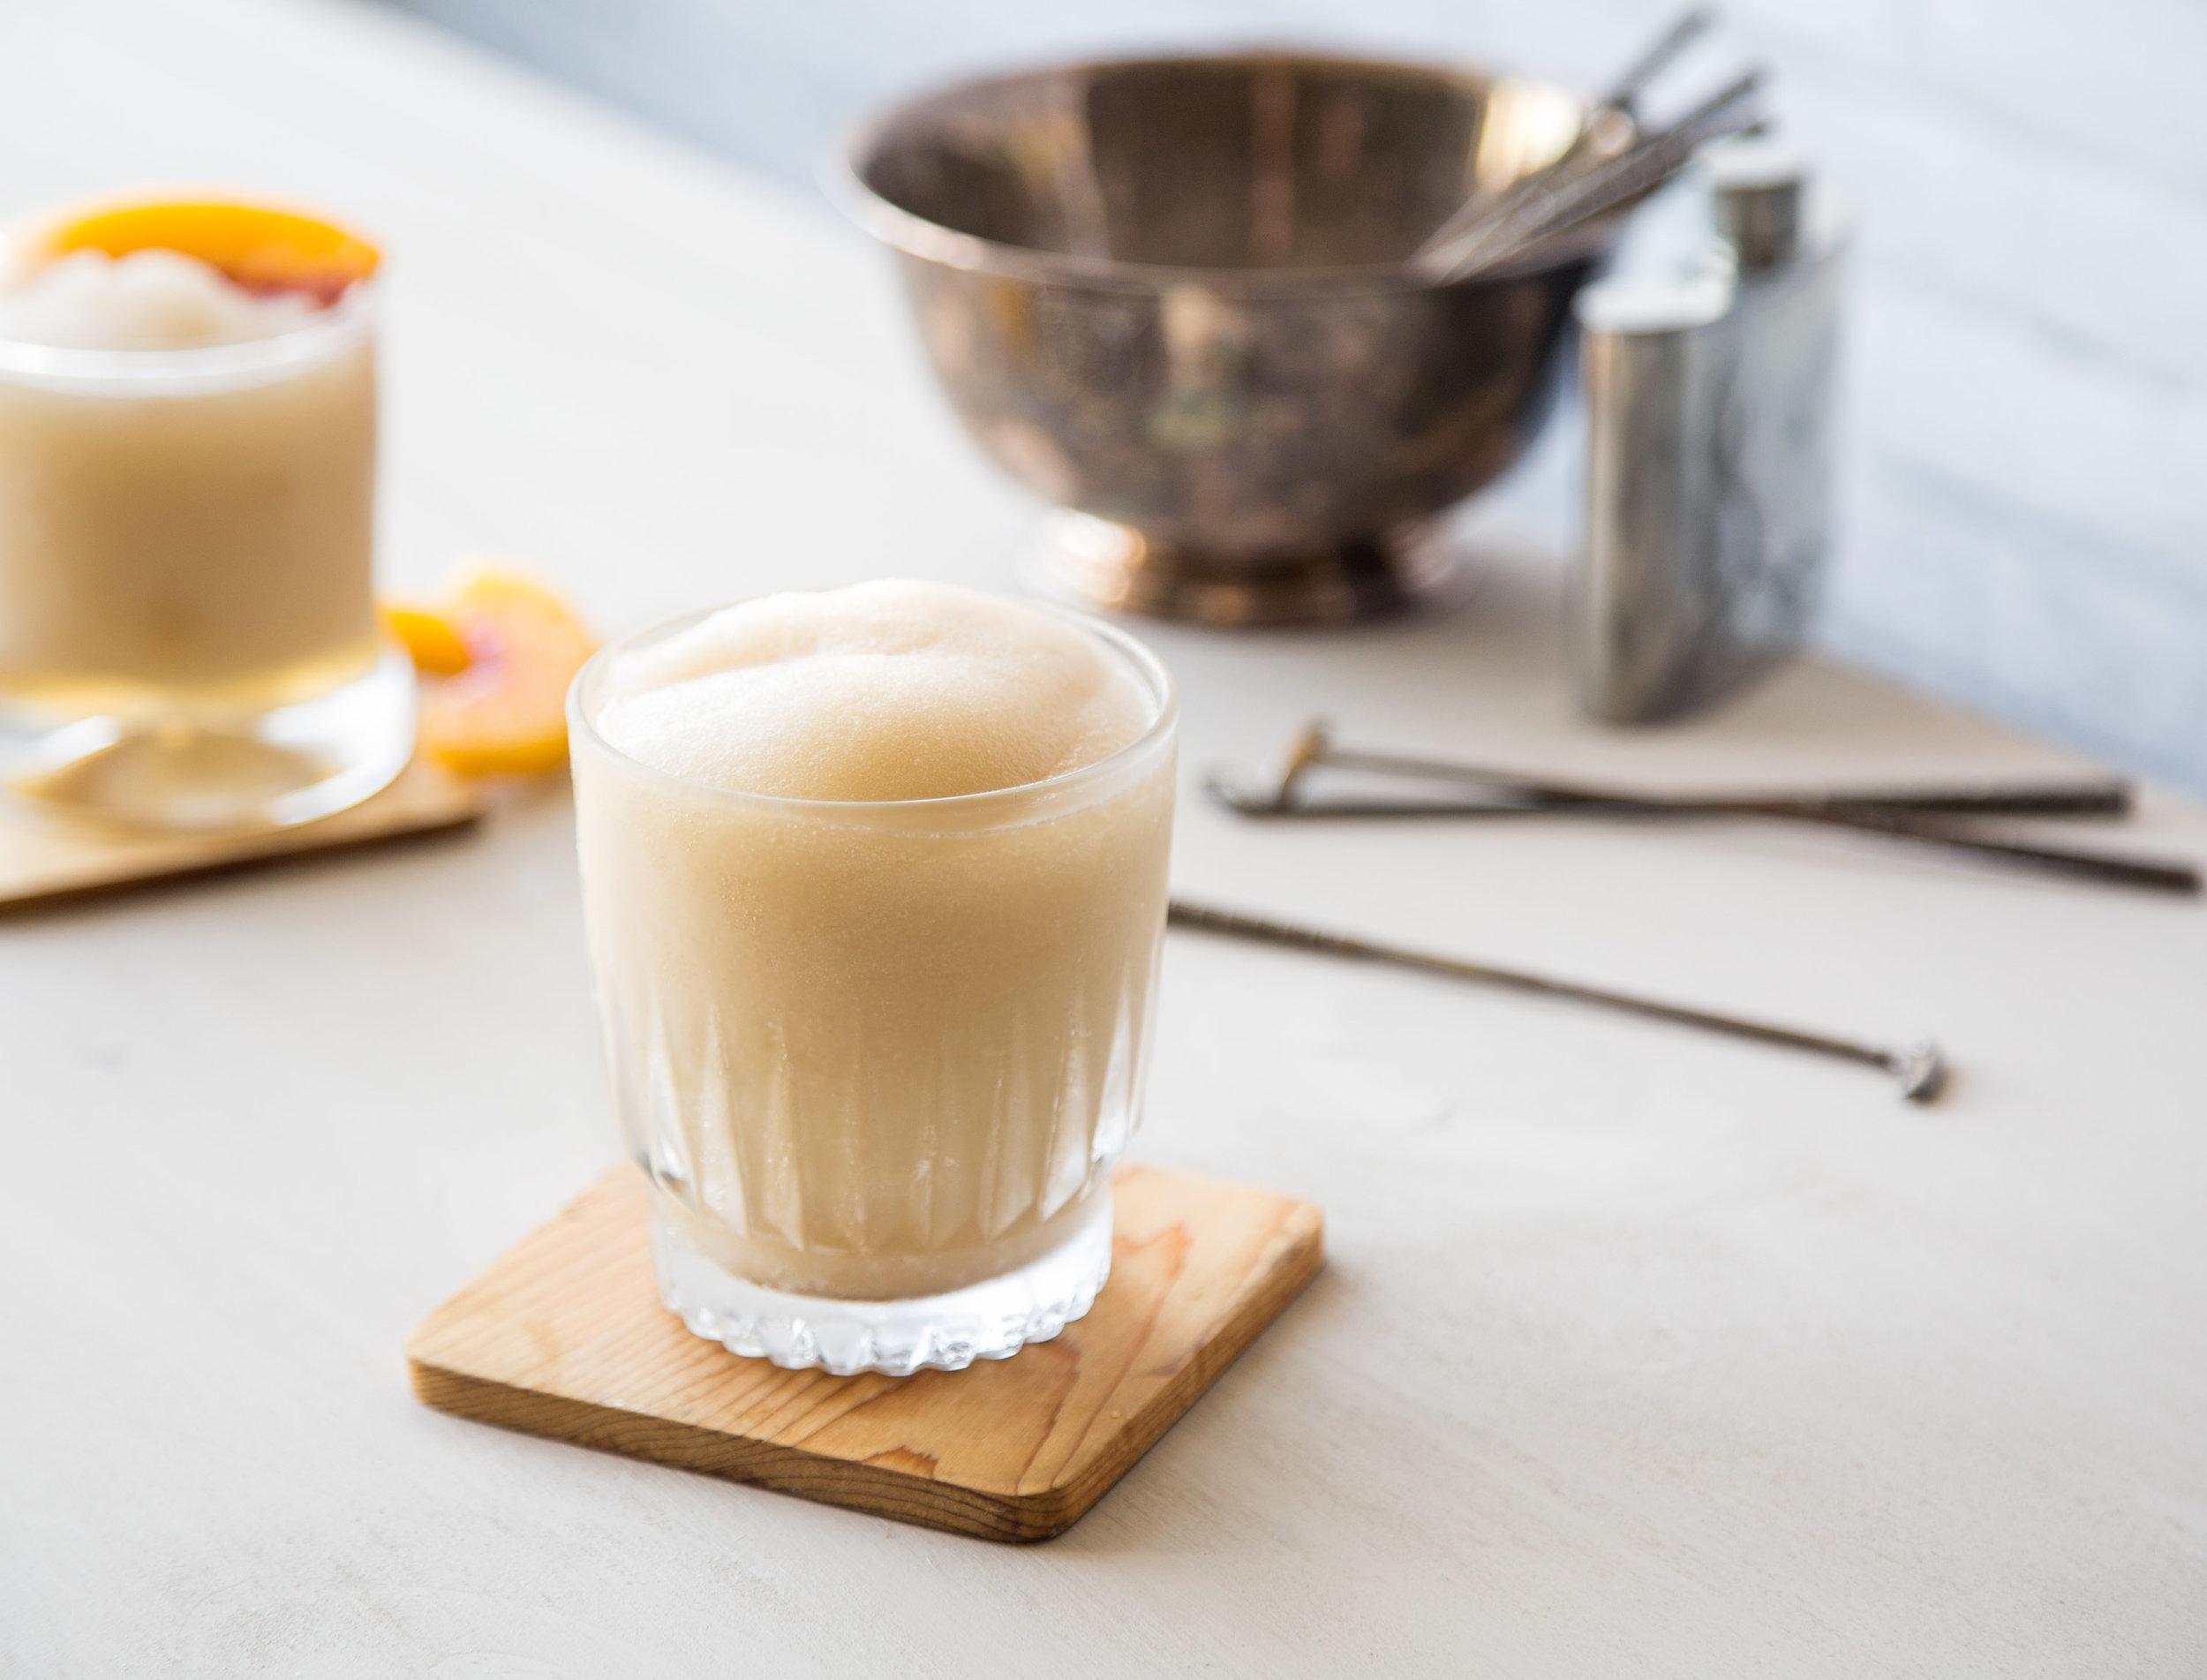 whiskey sour - Kelvin Citrus Slush Mix,Whiskey